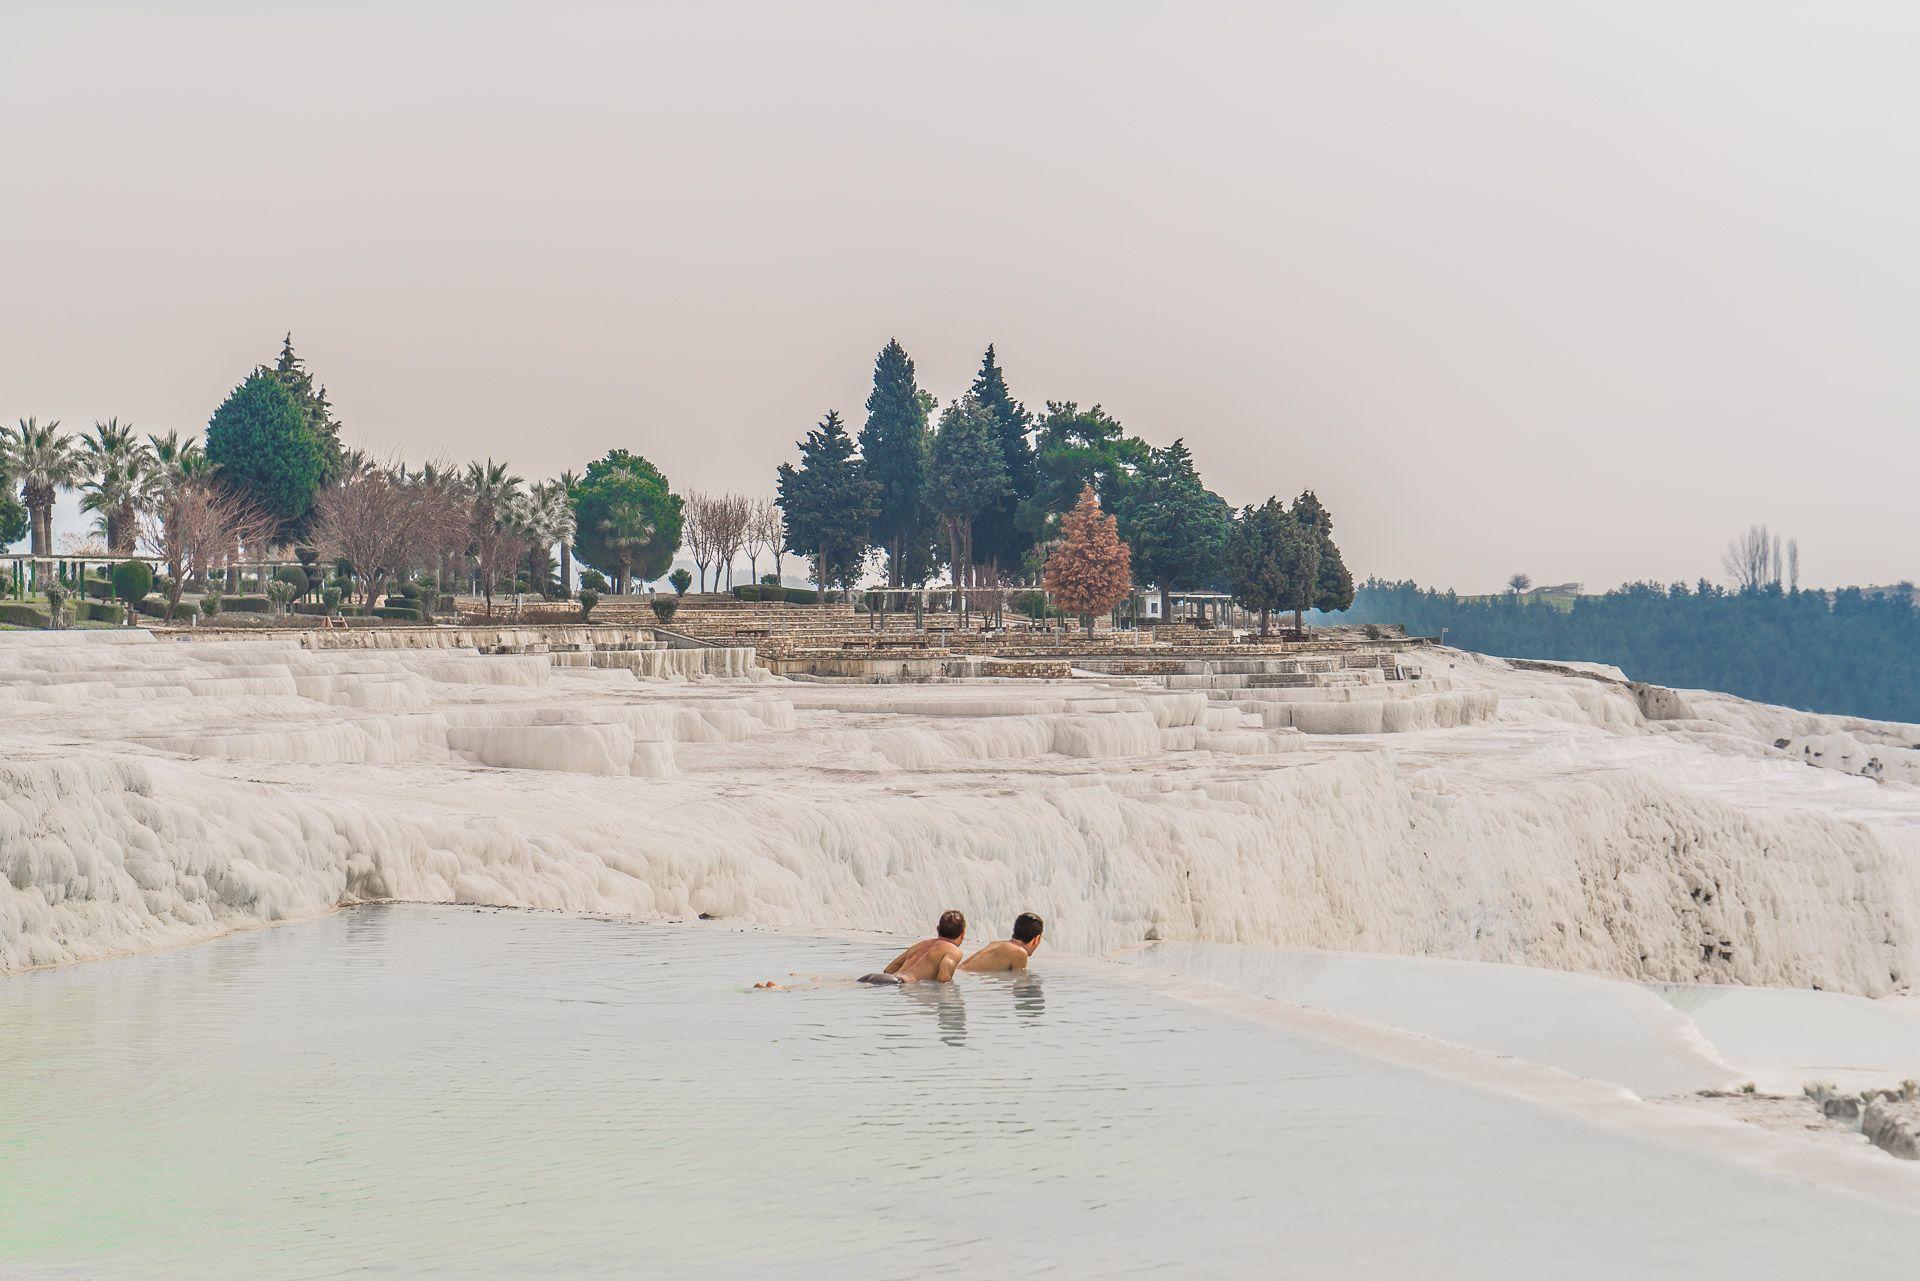 Lesvoyageuses-voyage-en-turquie-itineraire-pamukkale-12